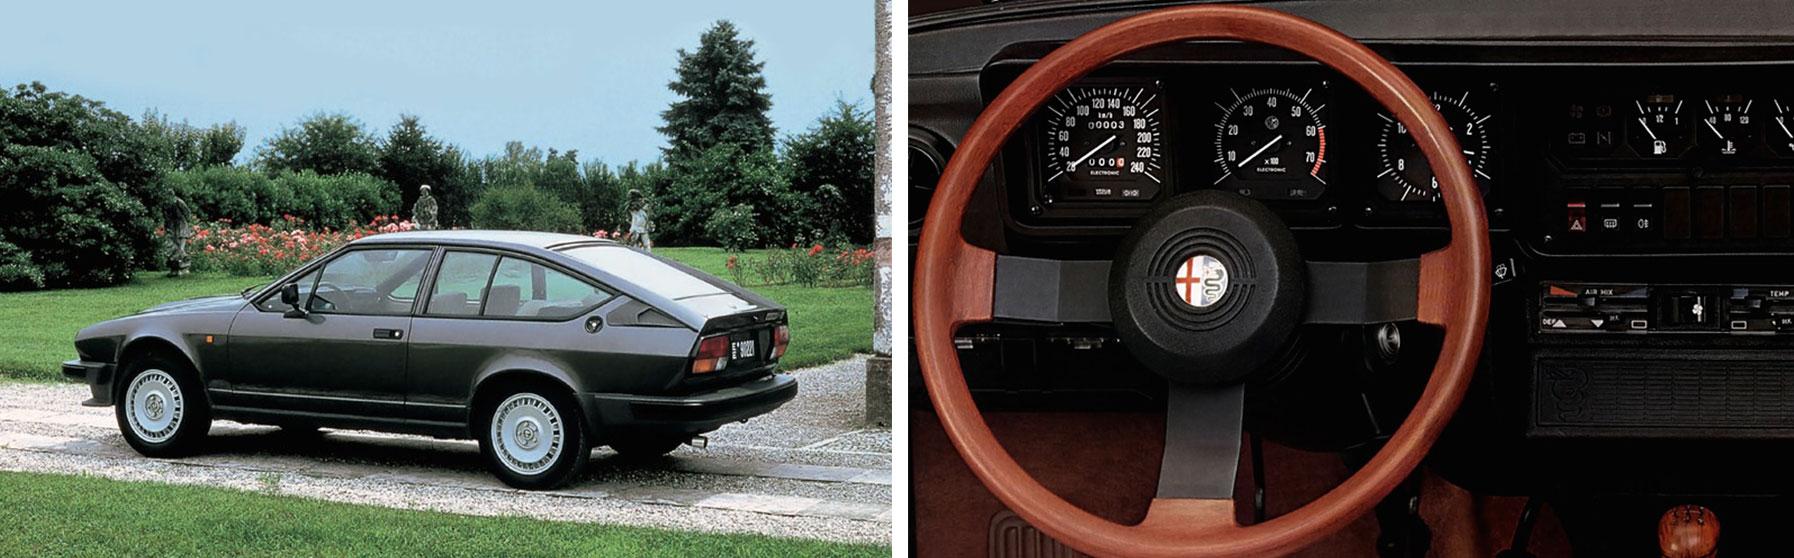 Alfa Romeo Alfetta GTV 2.5